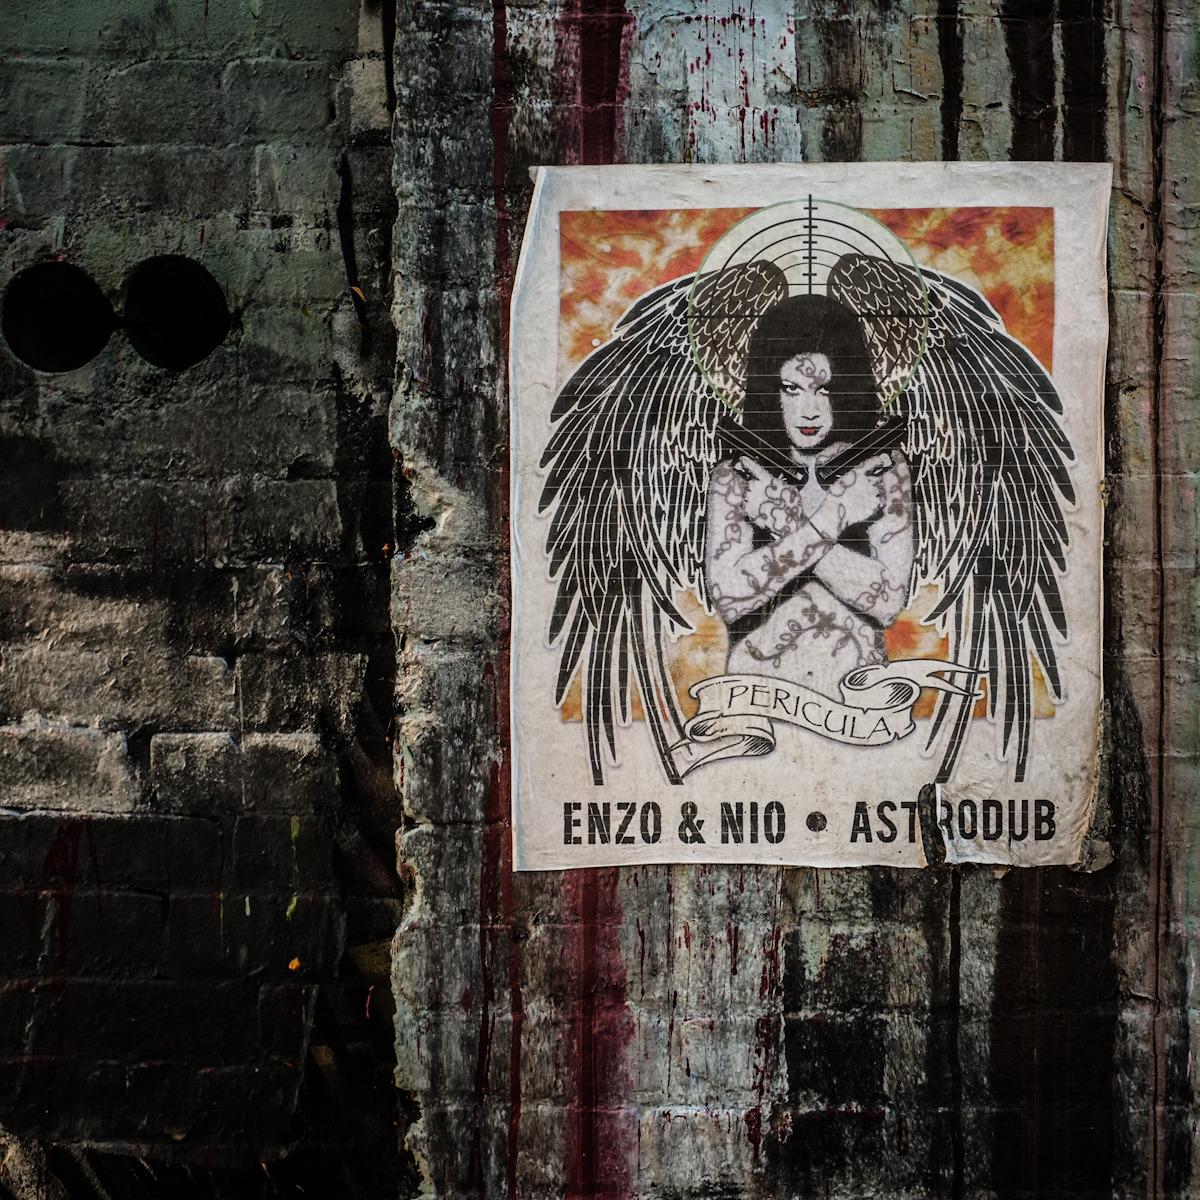 247 - Enzo & Nio   #366project #FujiX100